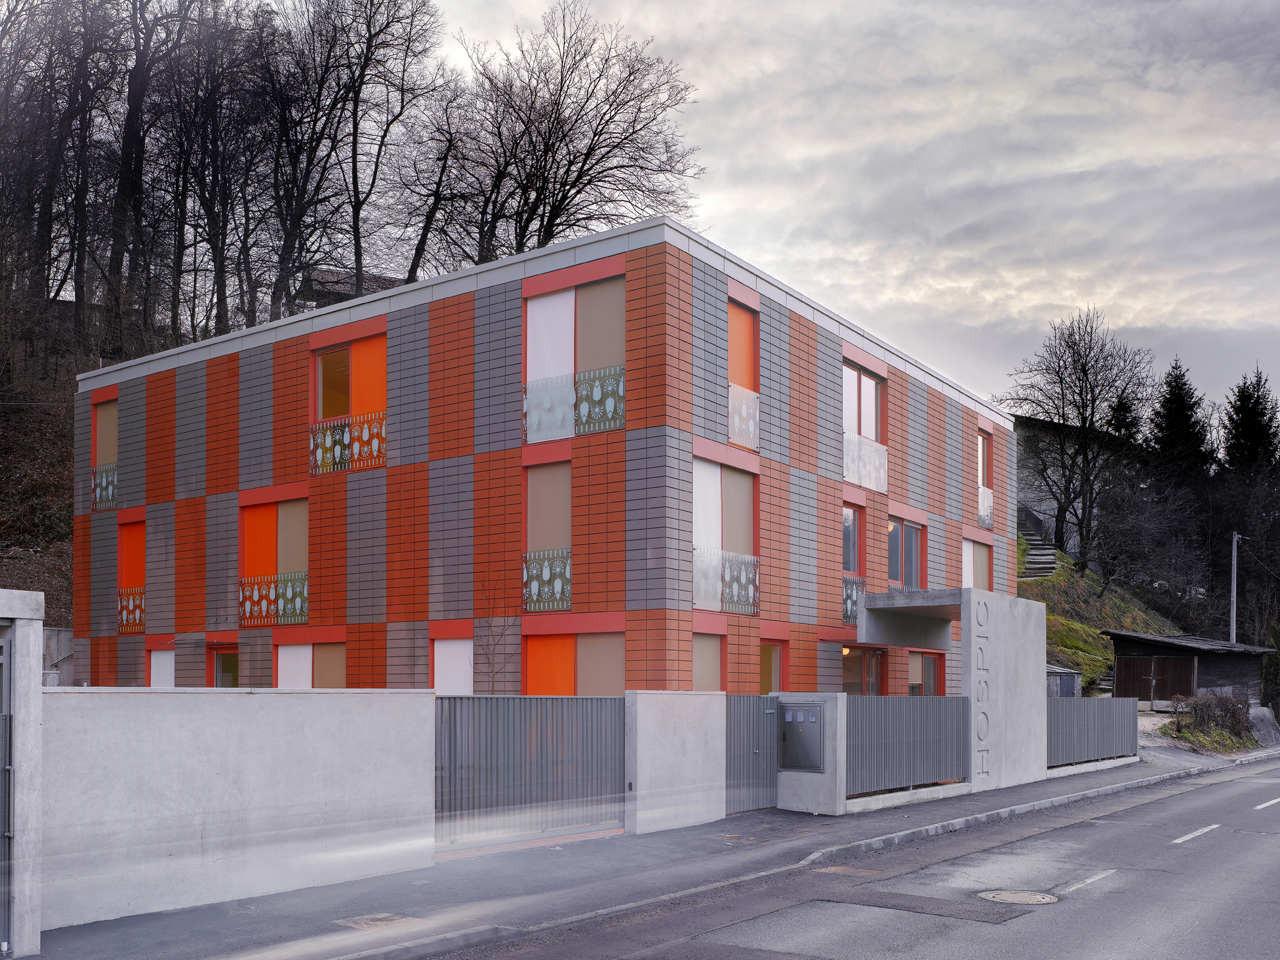 The Hospic Building / dans arhitekti, © Damjan Svarc